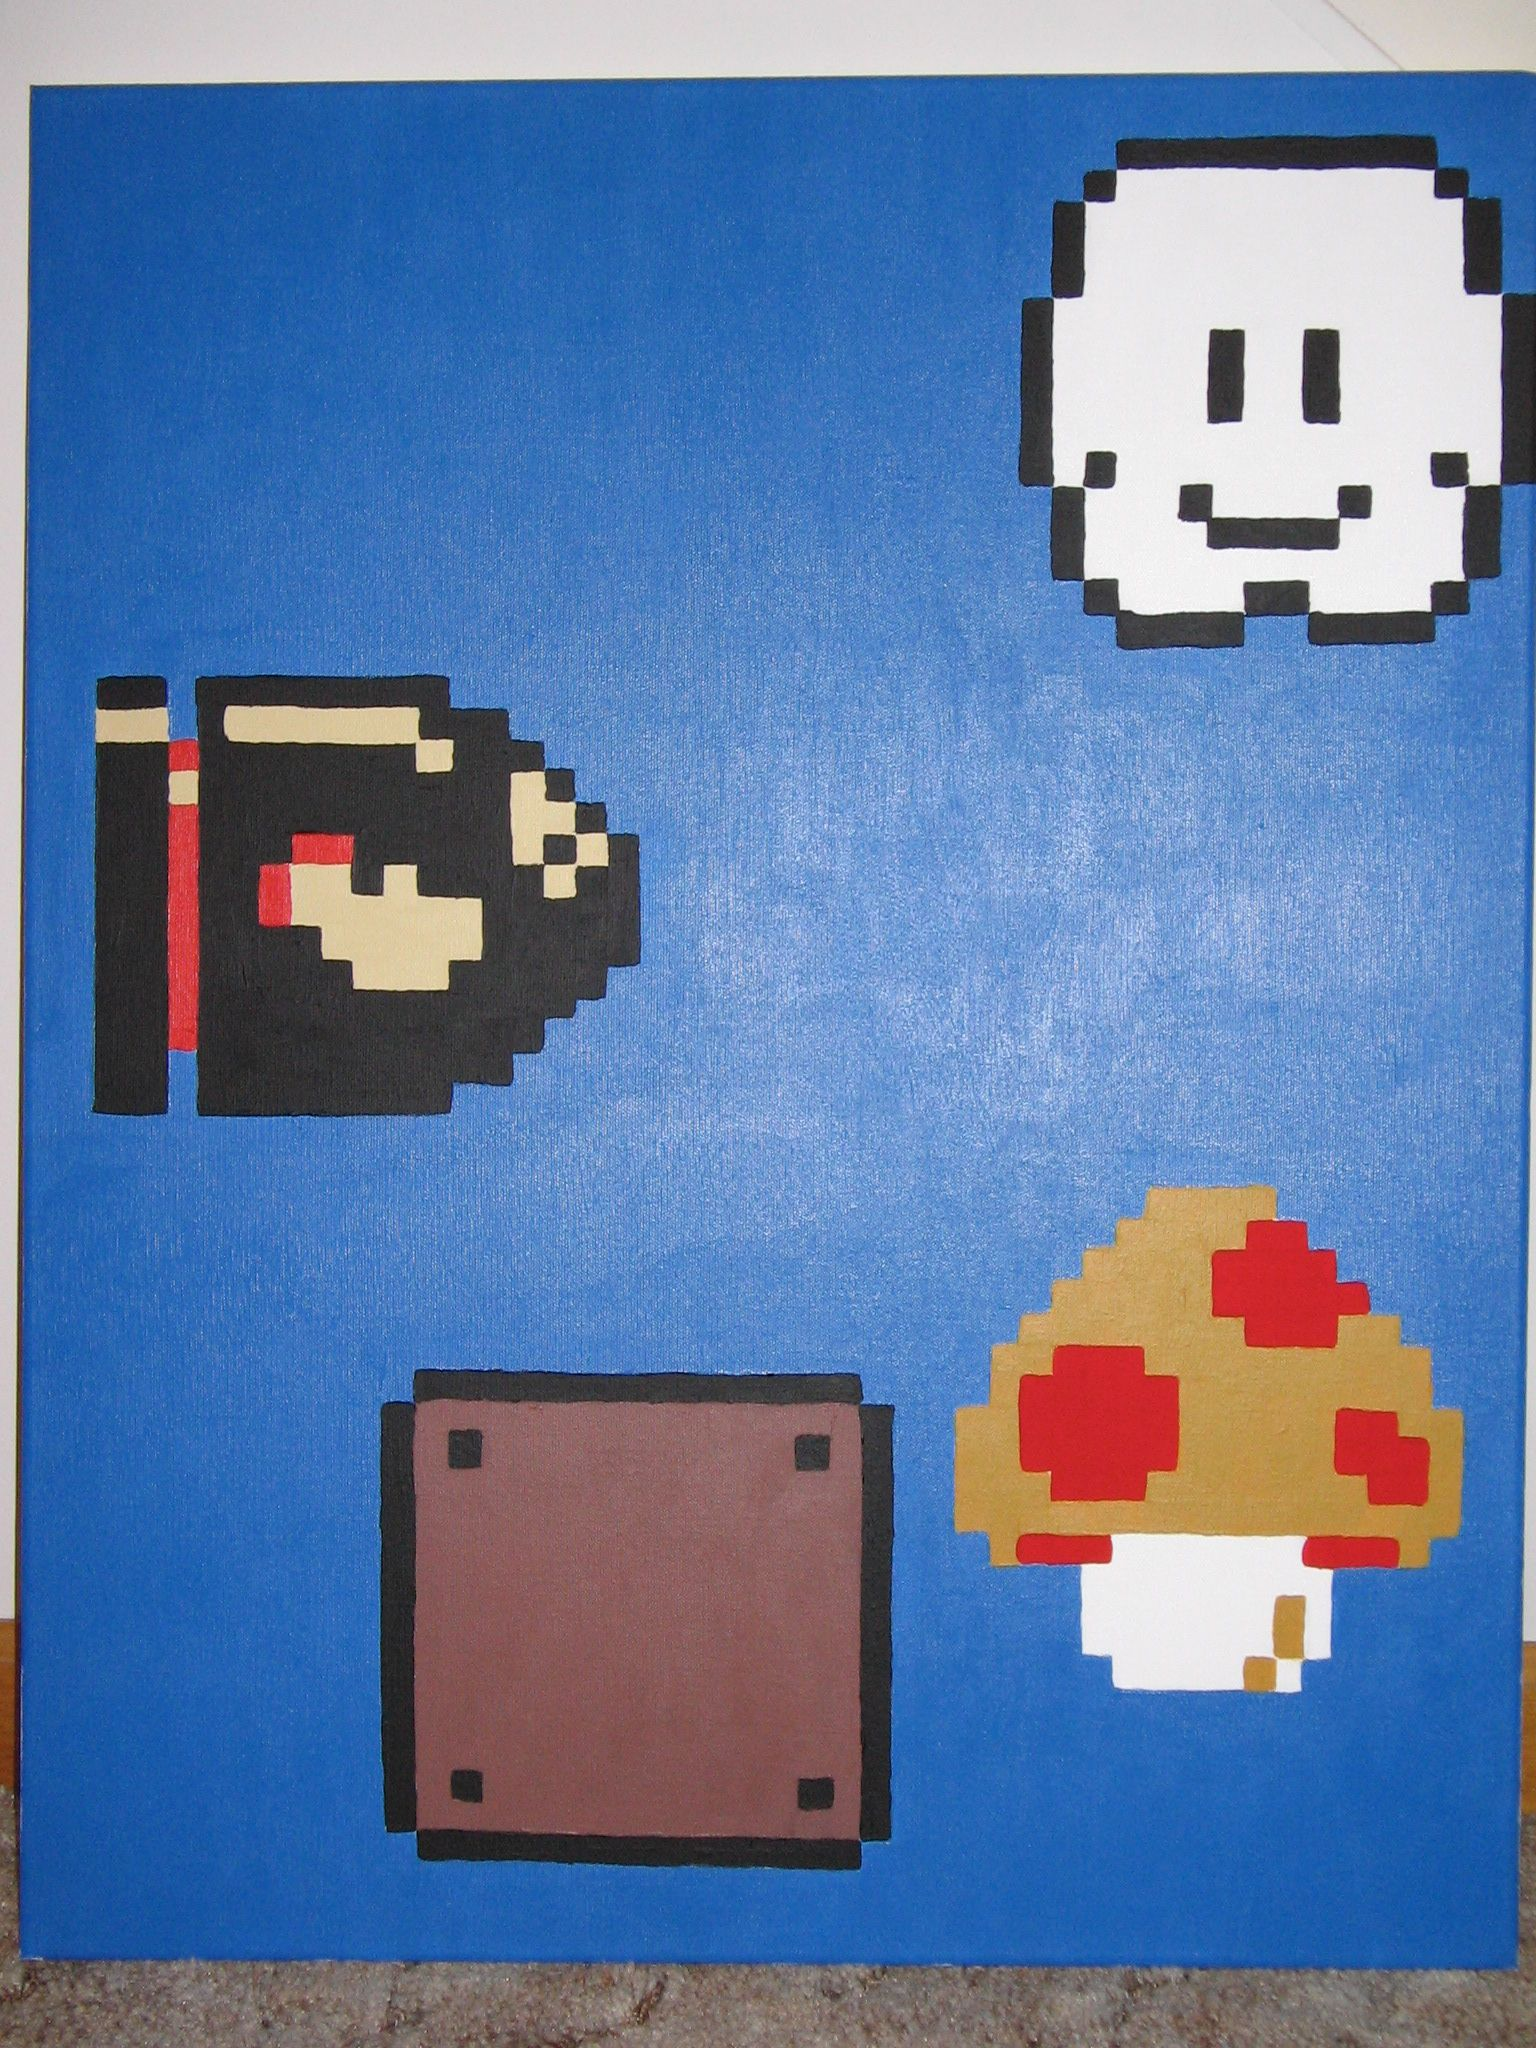 8 Bit Mario! Living Room ...